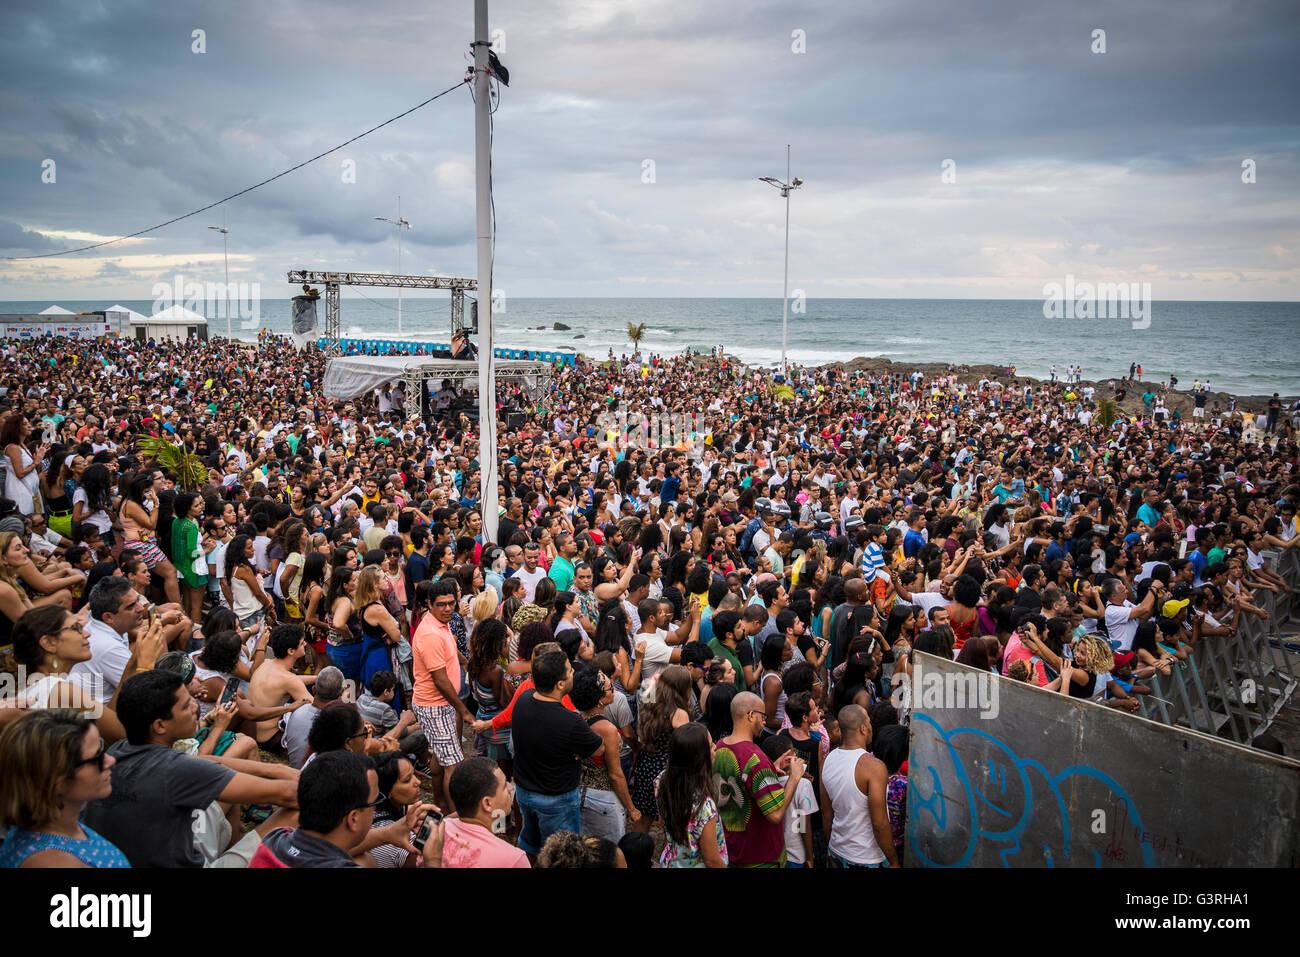 Multitud de personas viendo un concierto, Festival da Primavera, Jardim de ALAH, Salvador, Bahia, Brasil Imagen De Stock